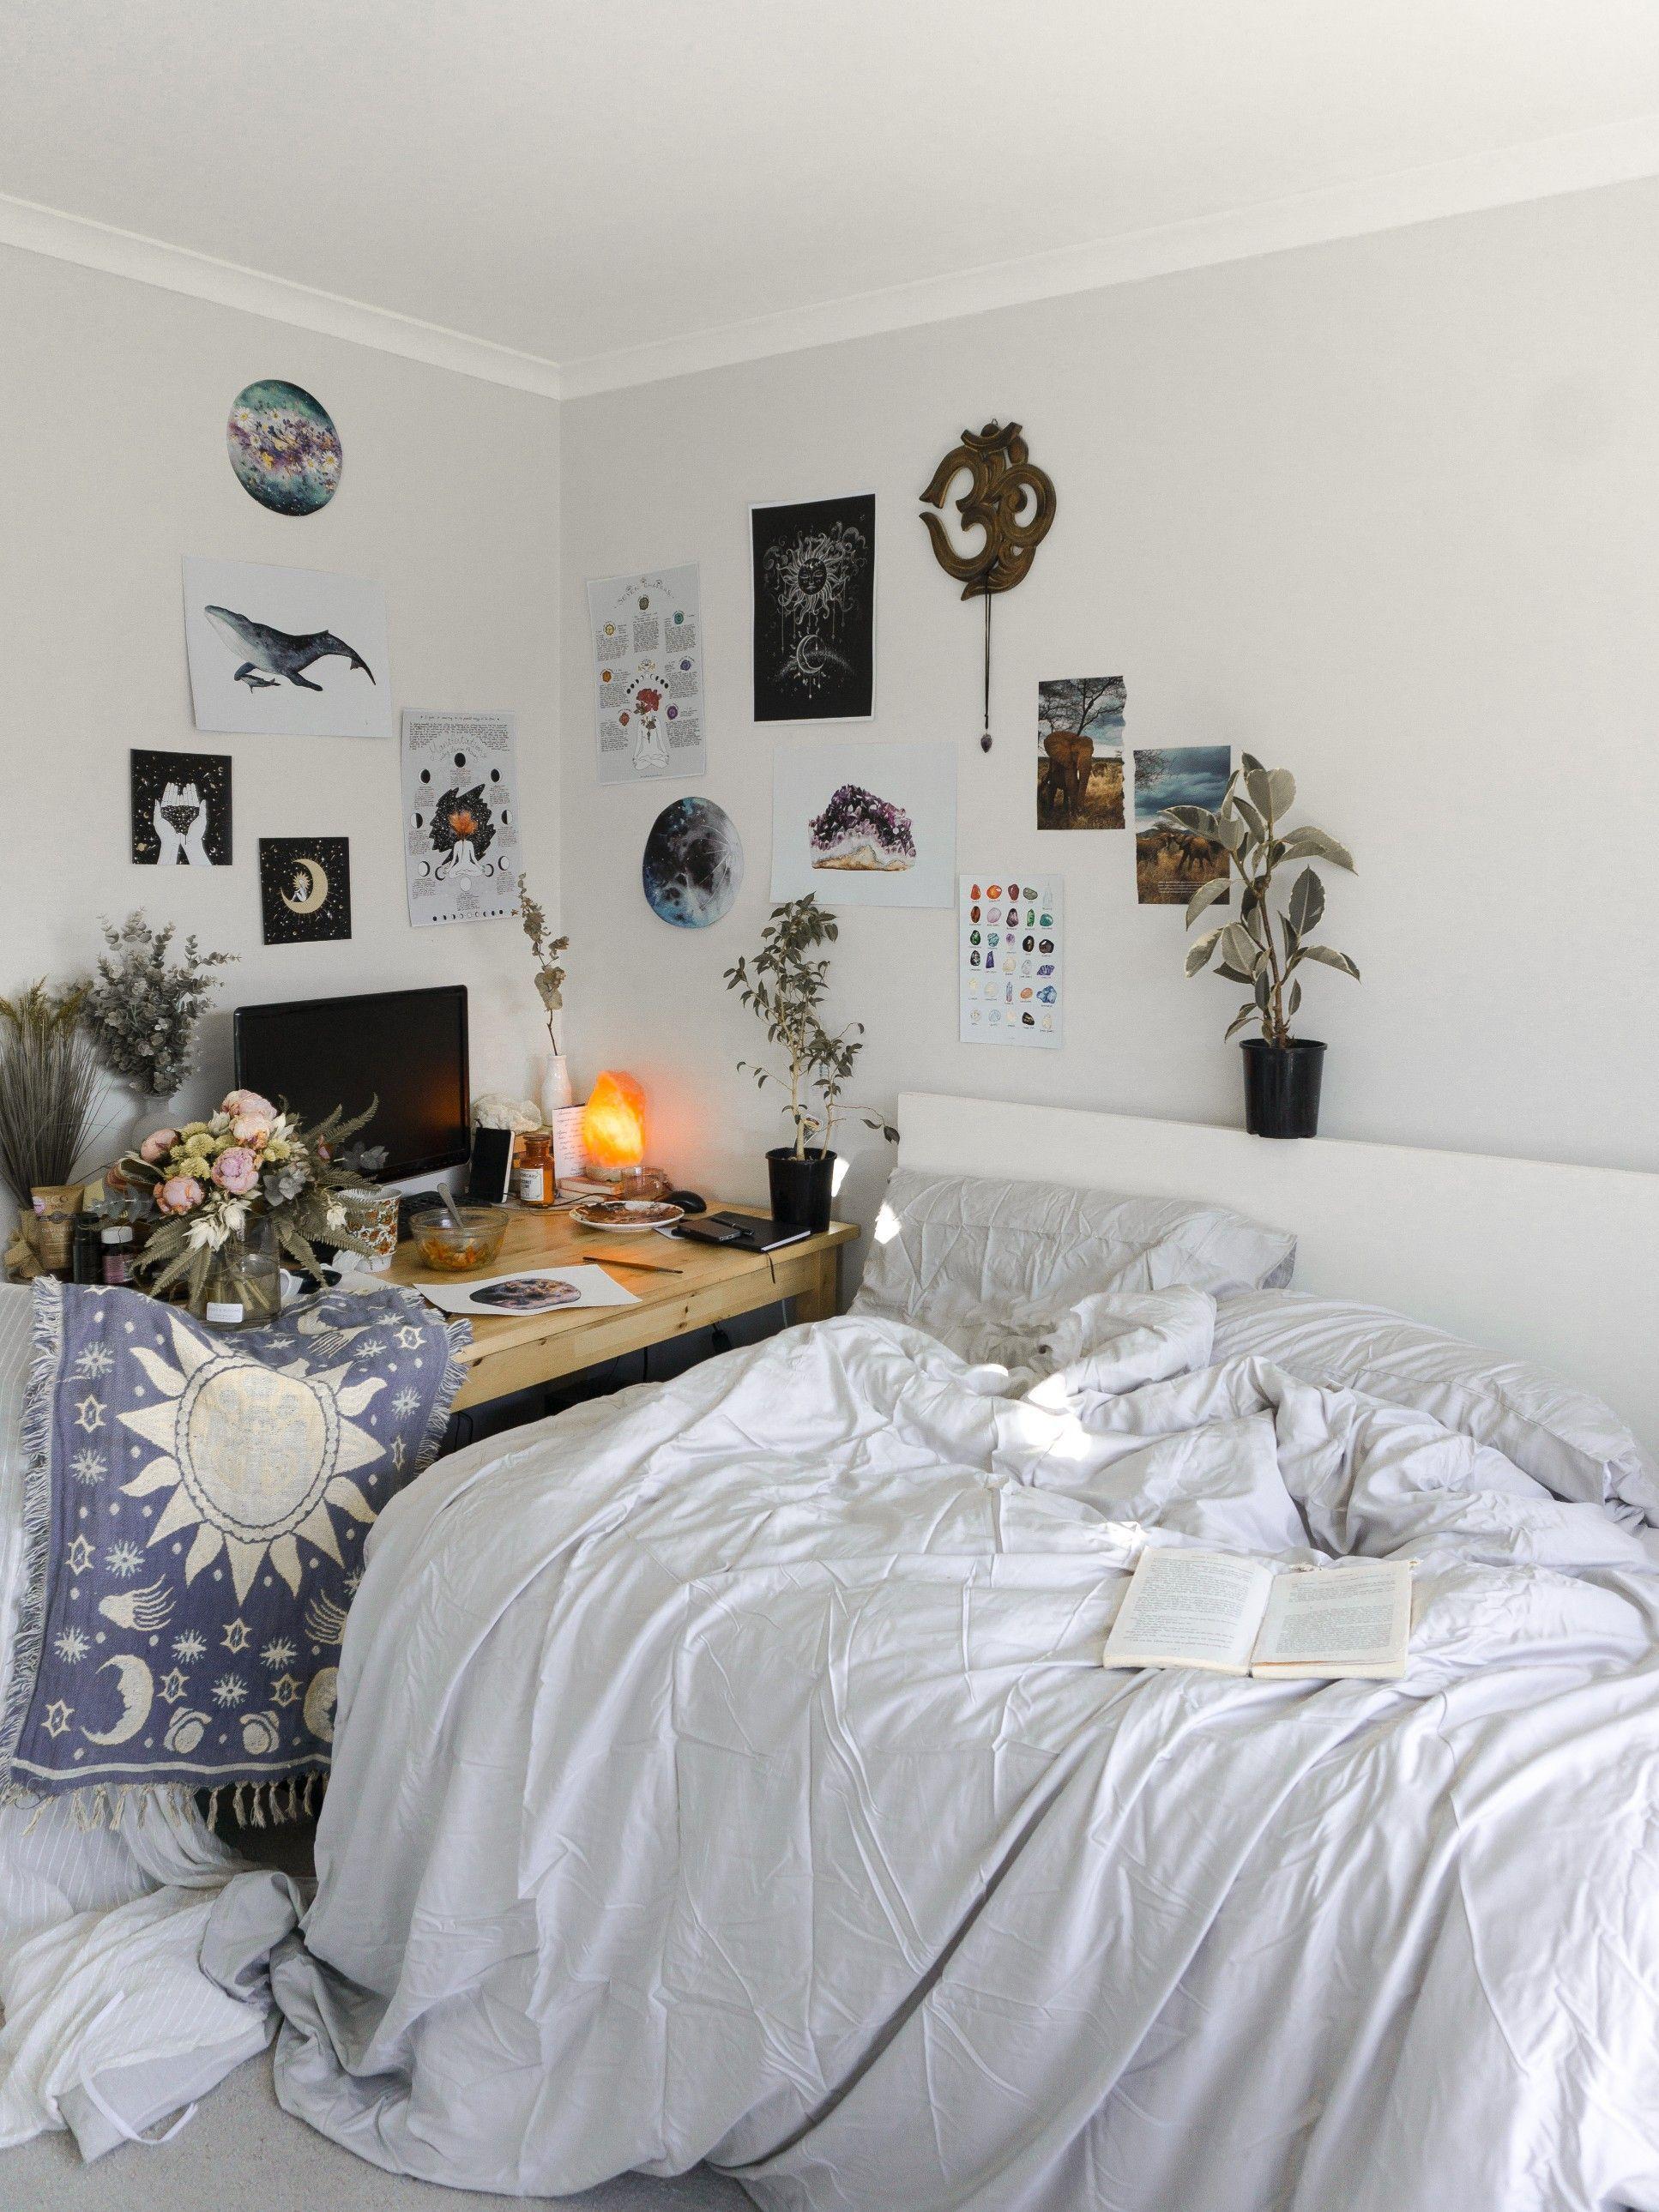 14 Most Popular Interior Design Styles Explained   Dorm ...